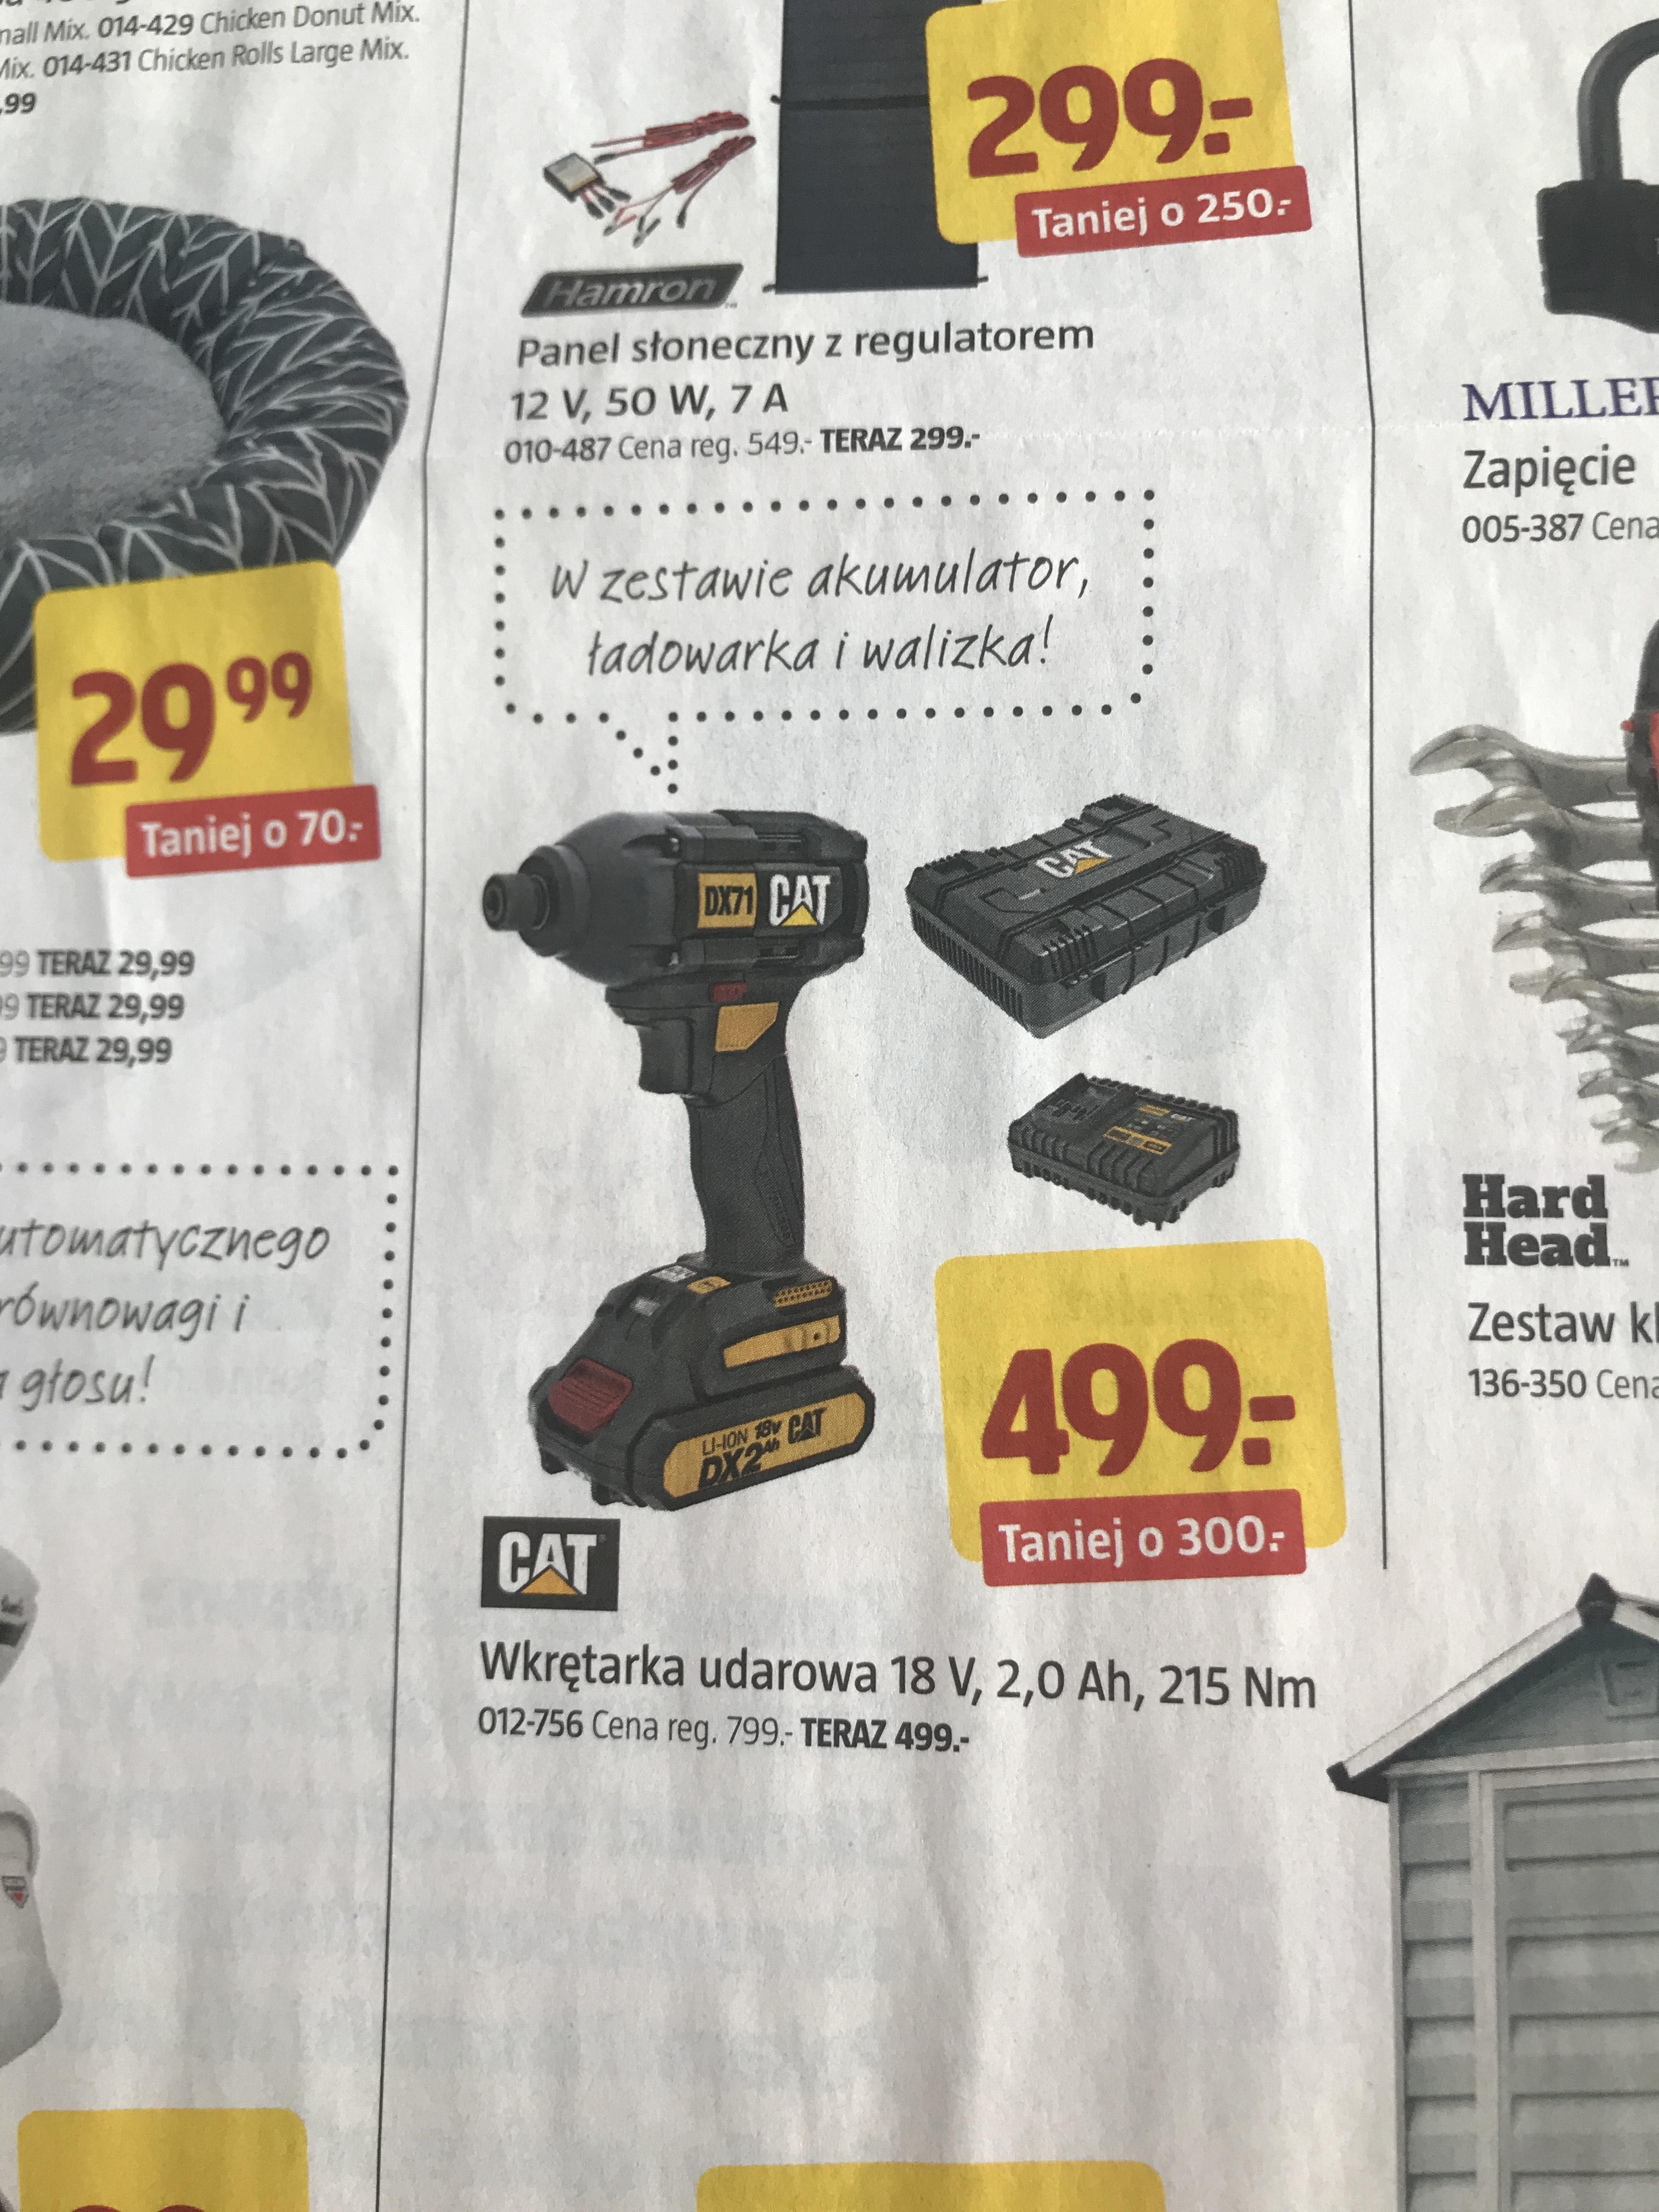 Wkrętarka udarowa CAT 18V Jula akumulator ładowarka i walizka gazetka